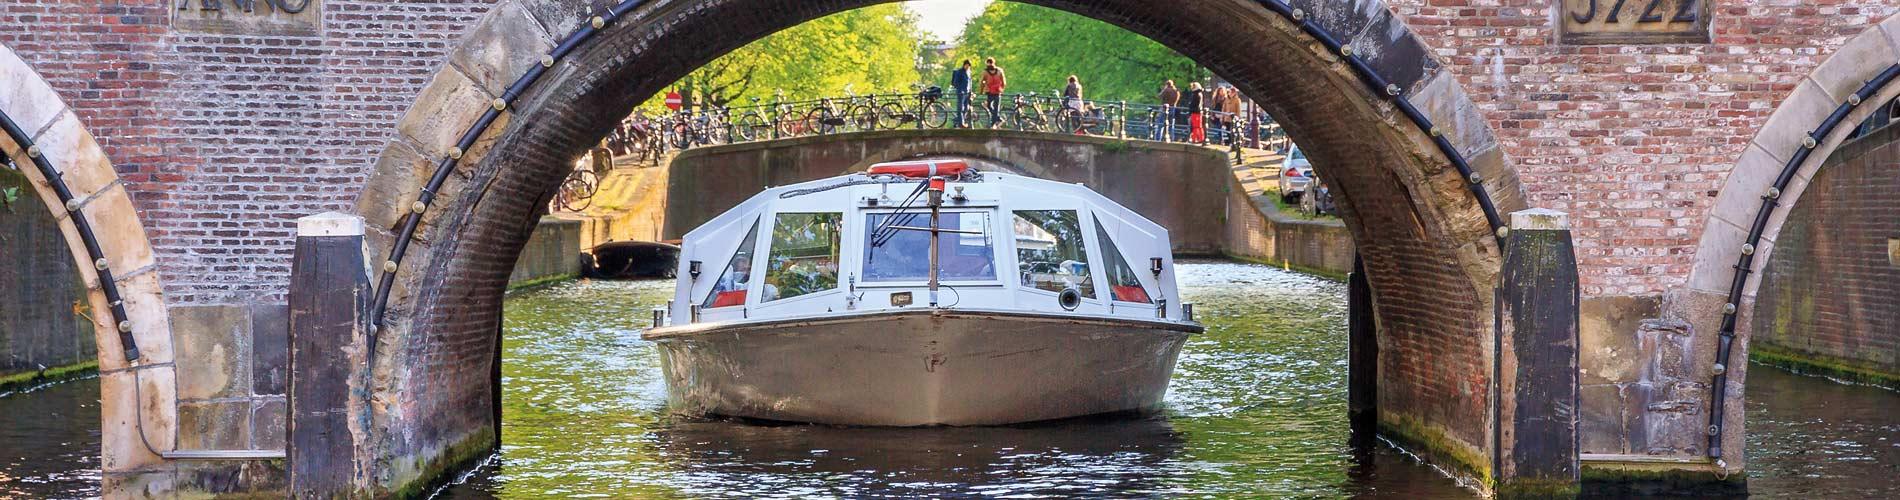 Blog_FamilyFunEurope_CanalCruise_Amsterdam_1900x500_Q120